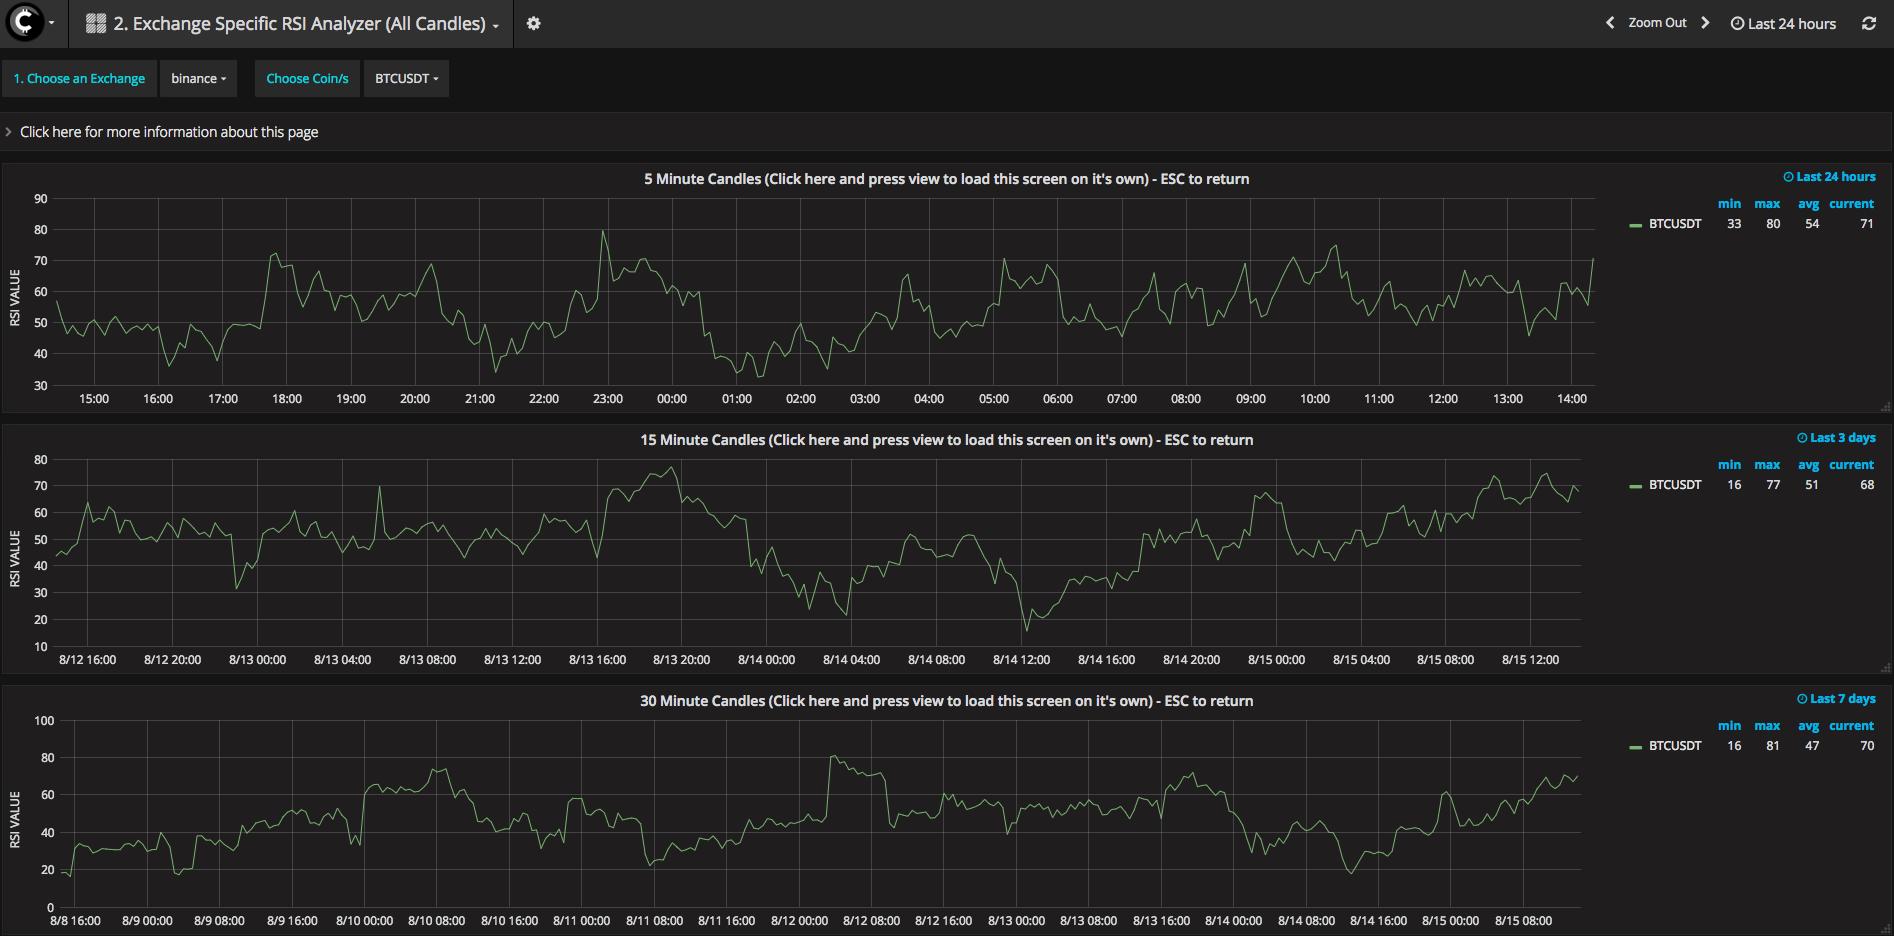 Exchange Specific RSI Analyzer